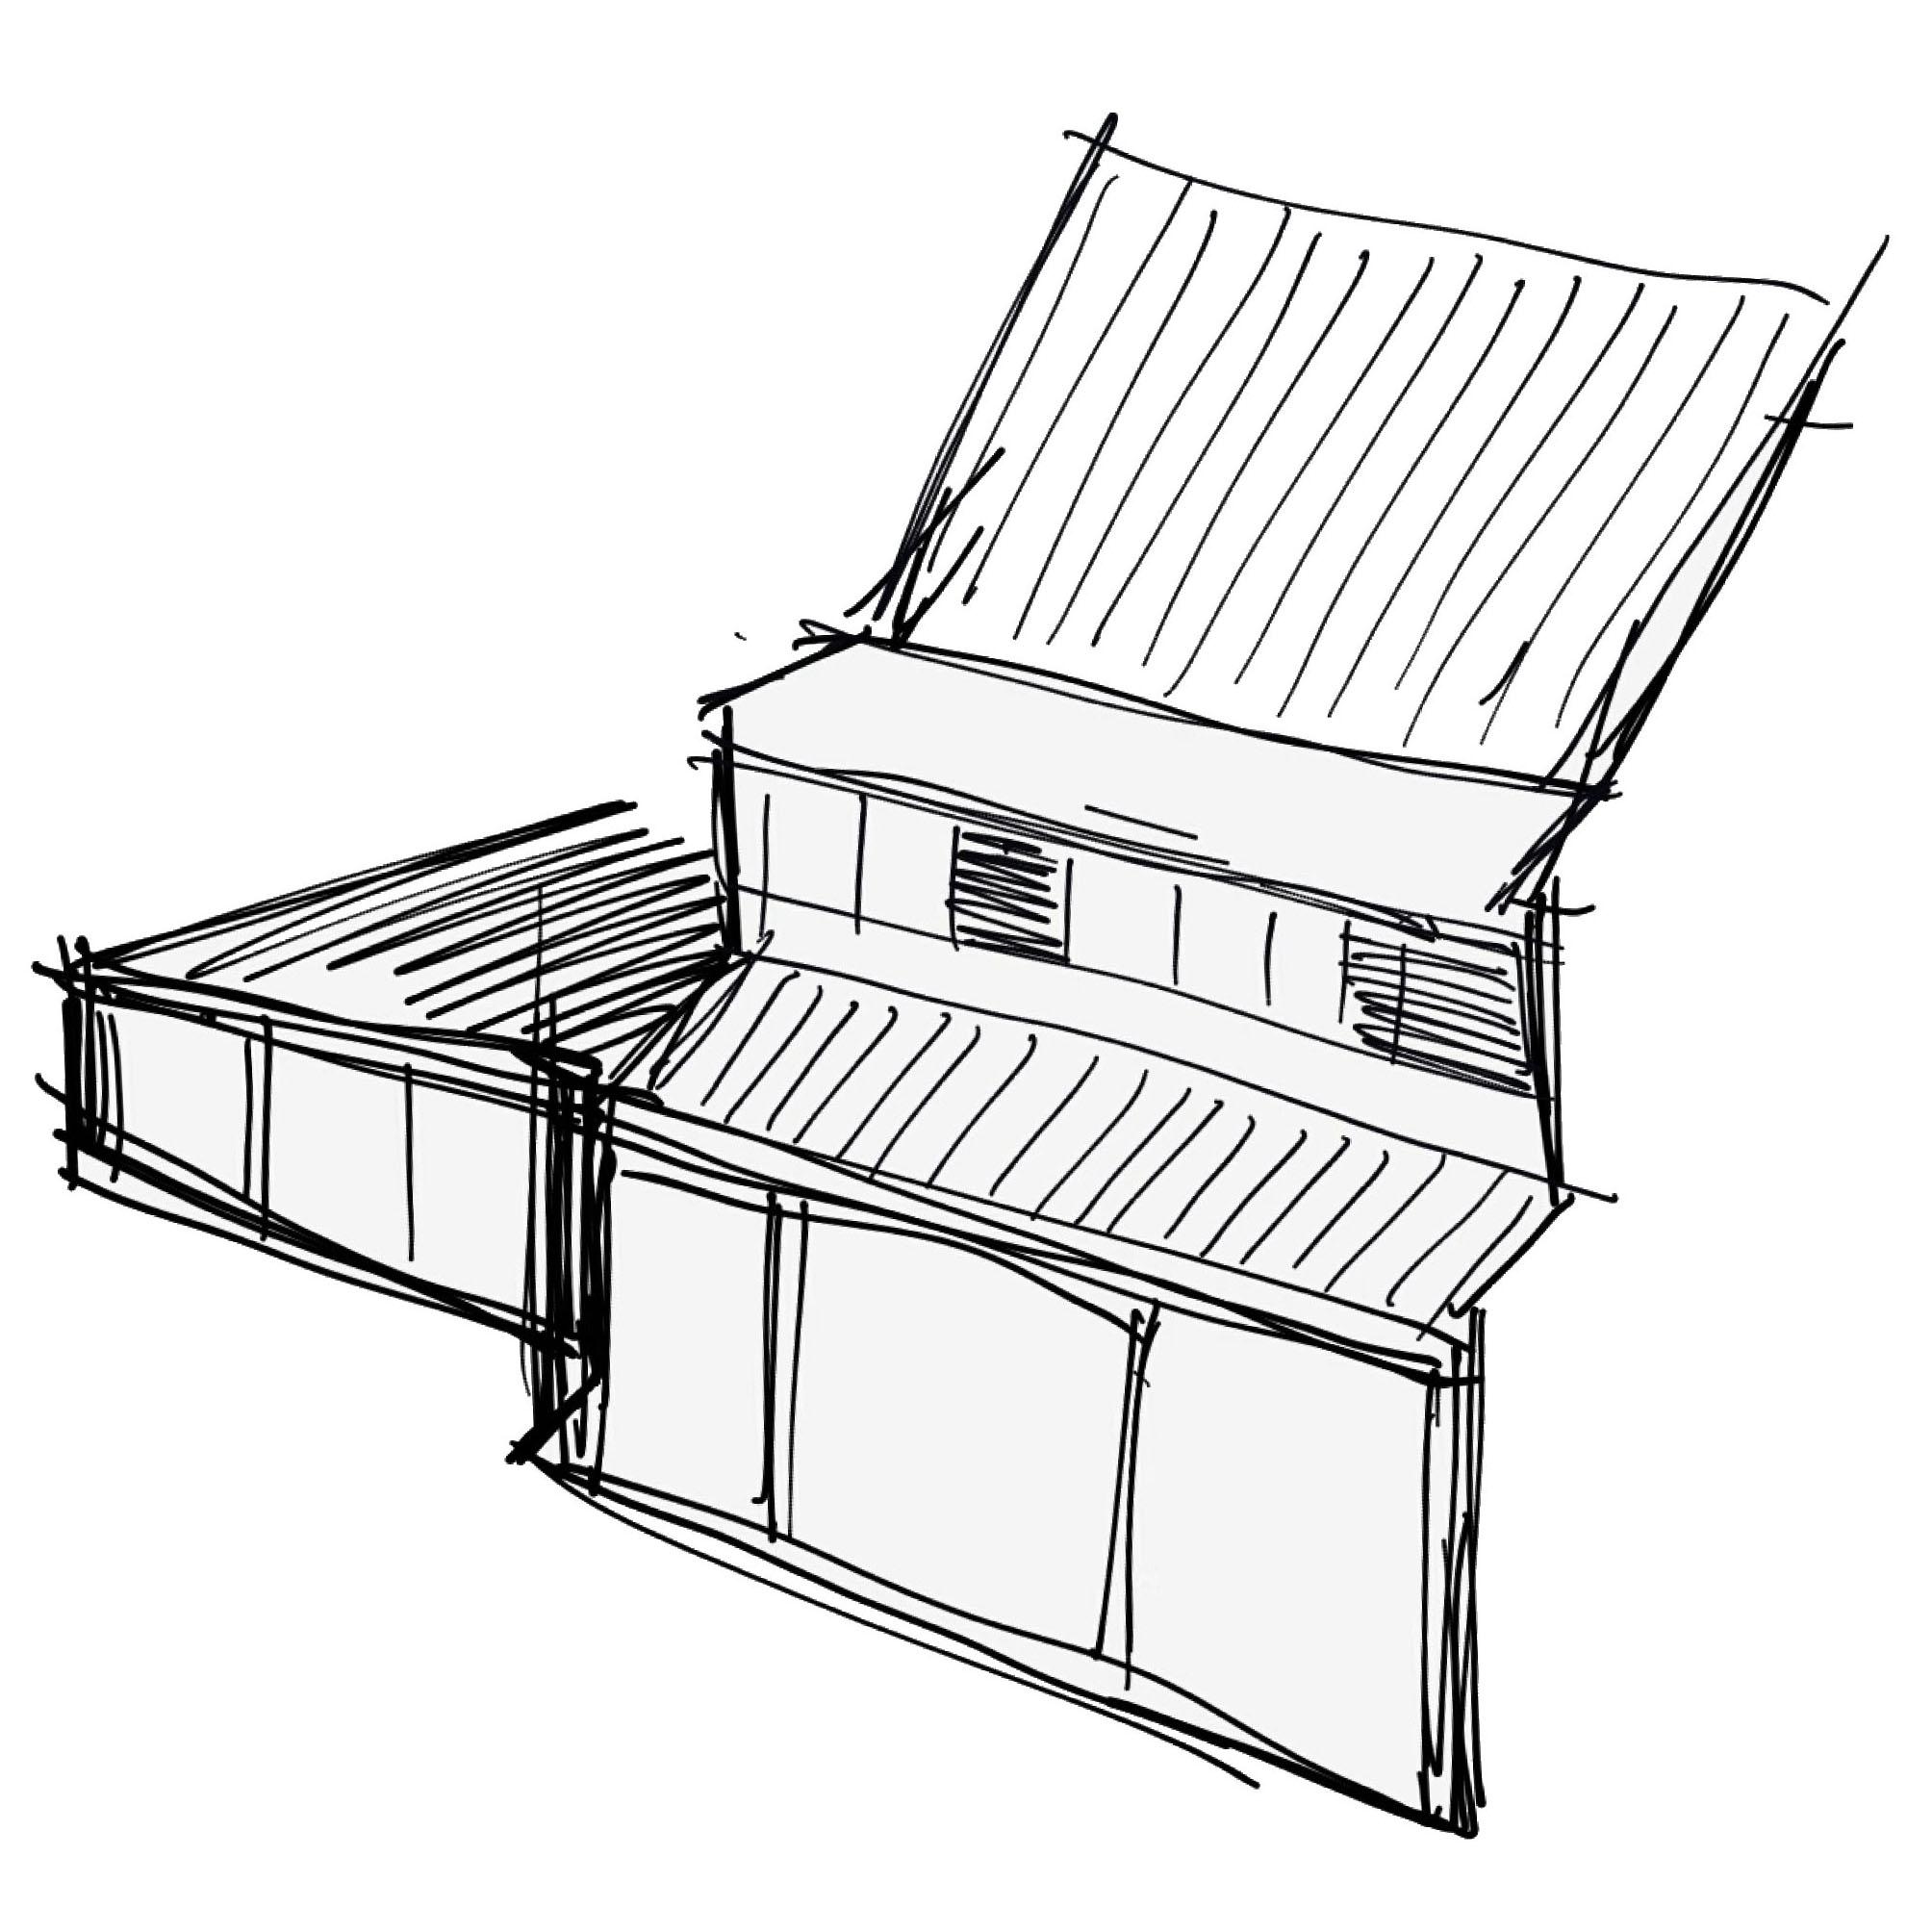 stoel_architect_kampen_stoelaantafel (8)